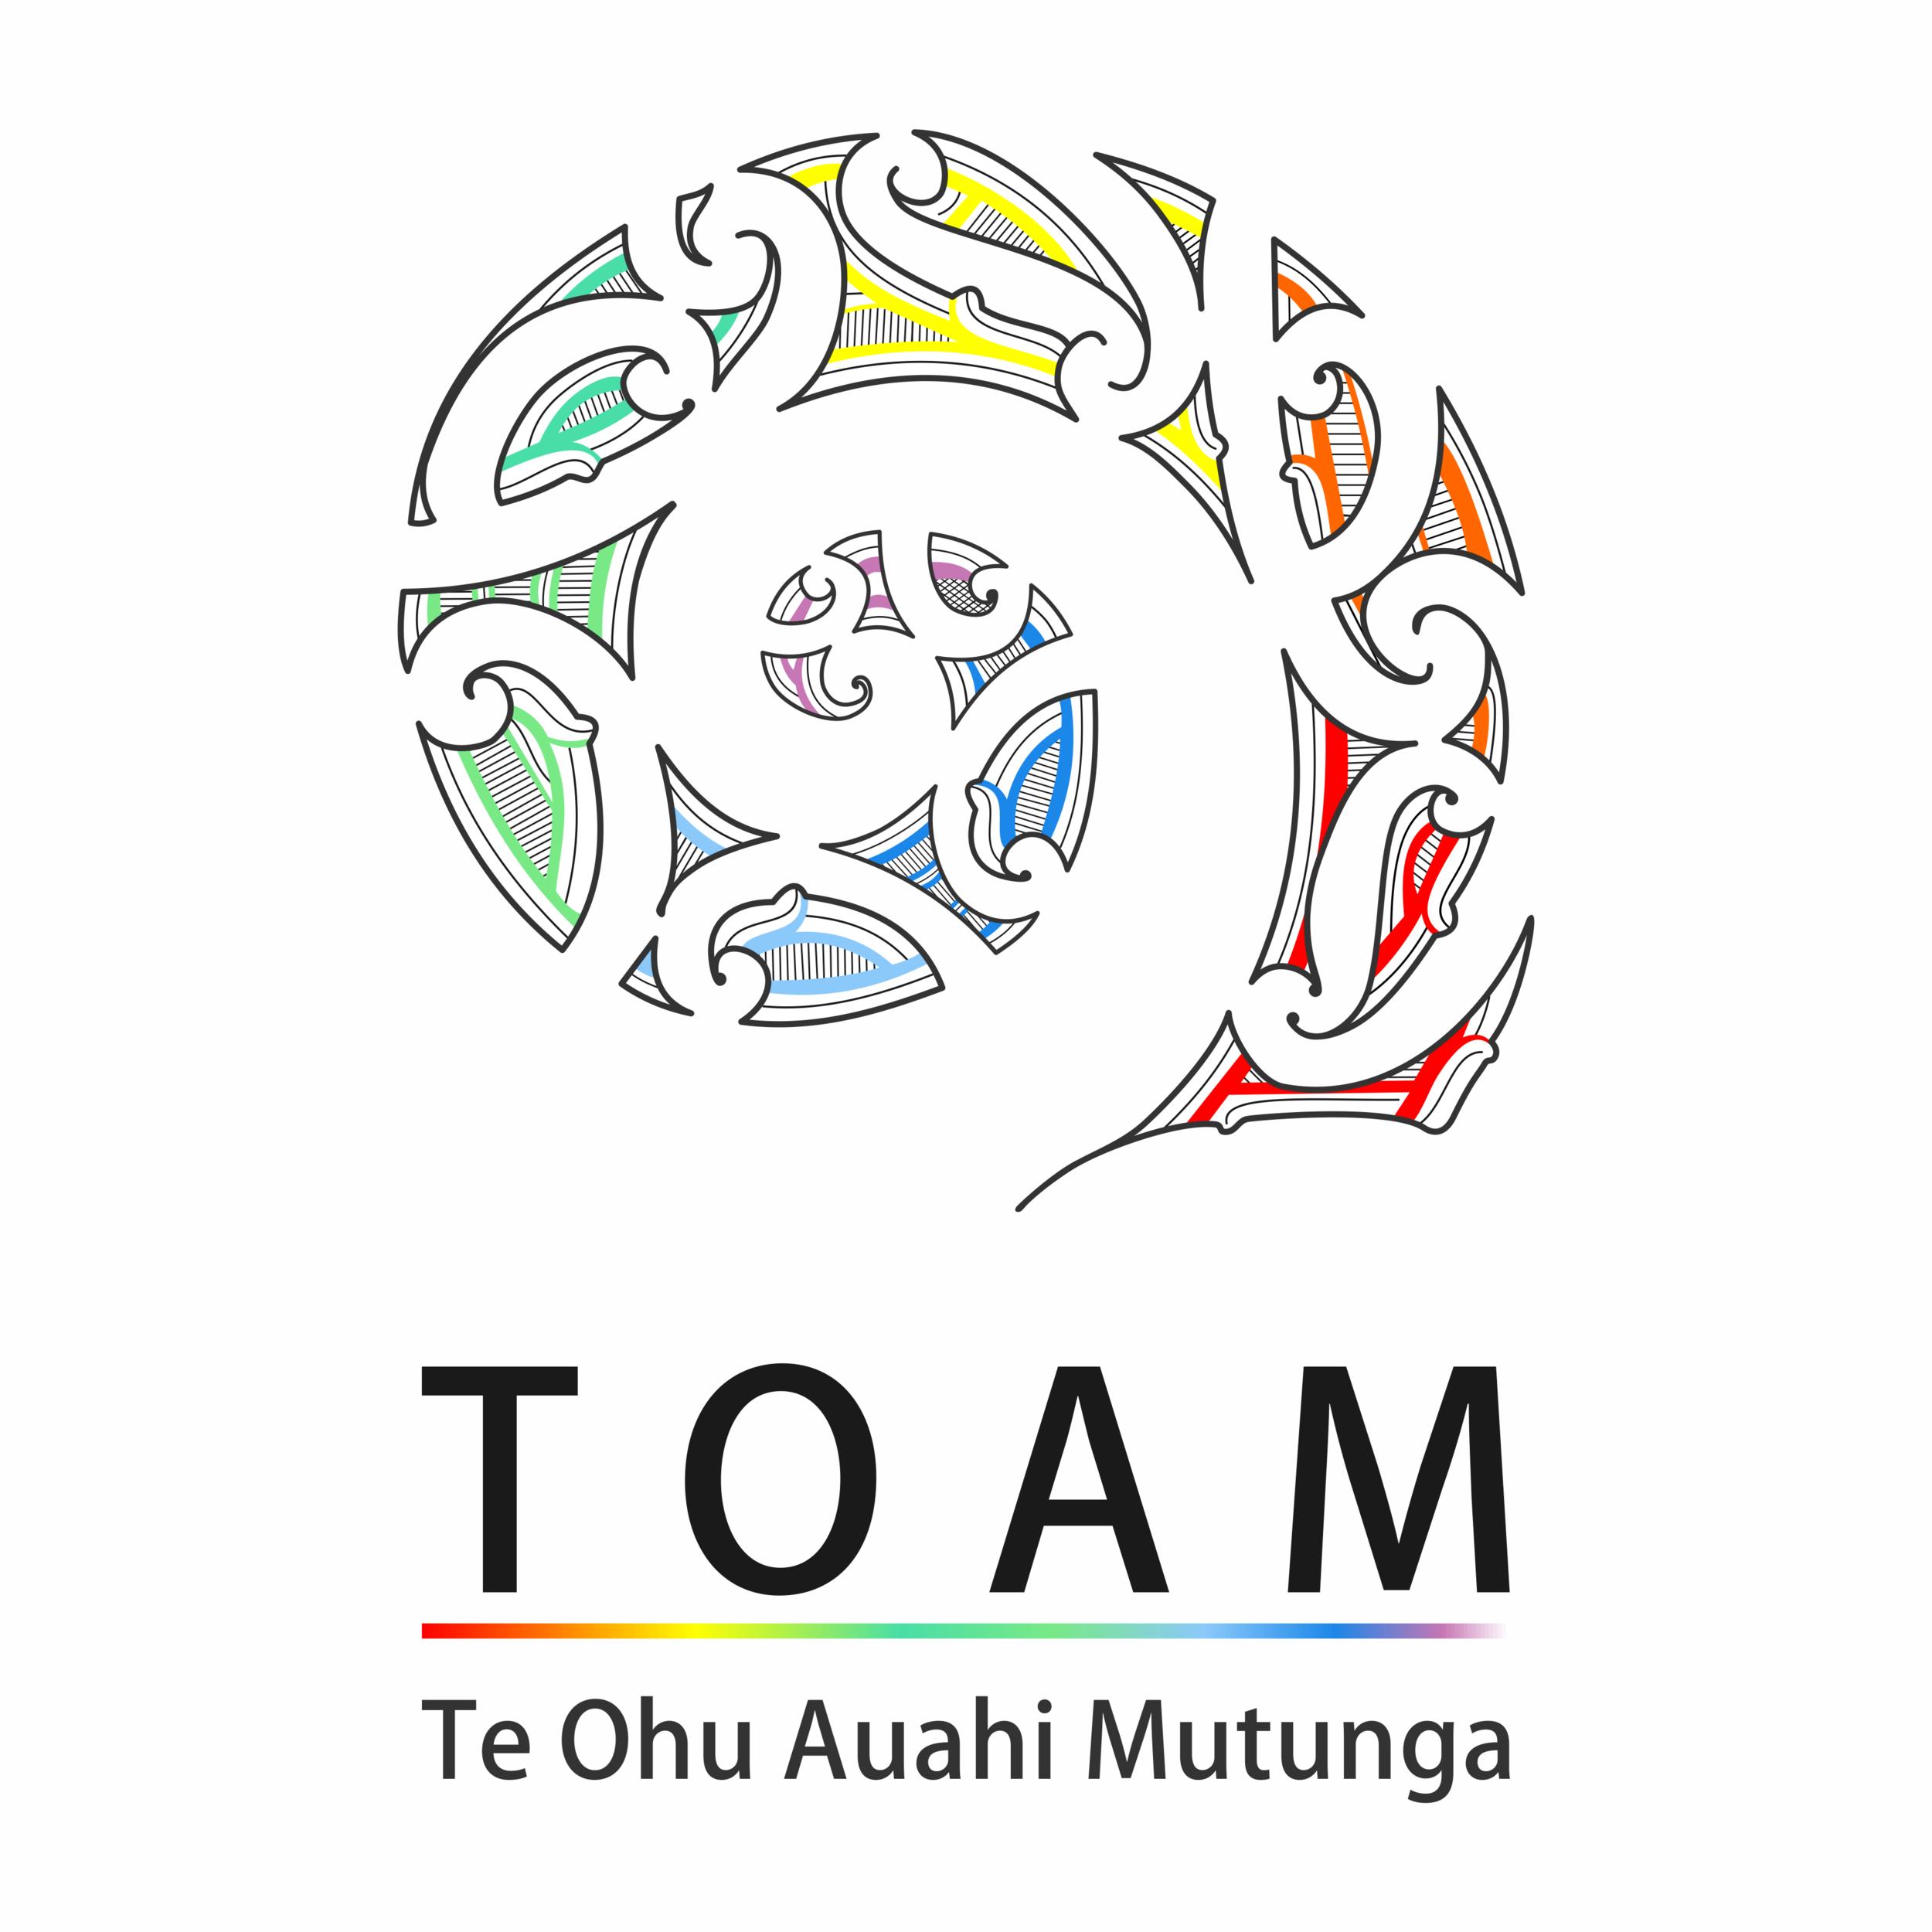 TOAM logo.png